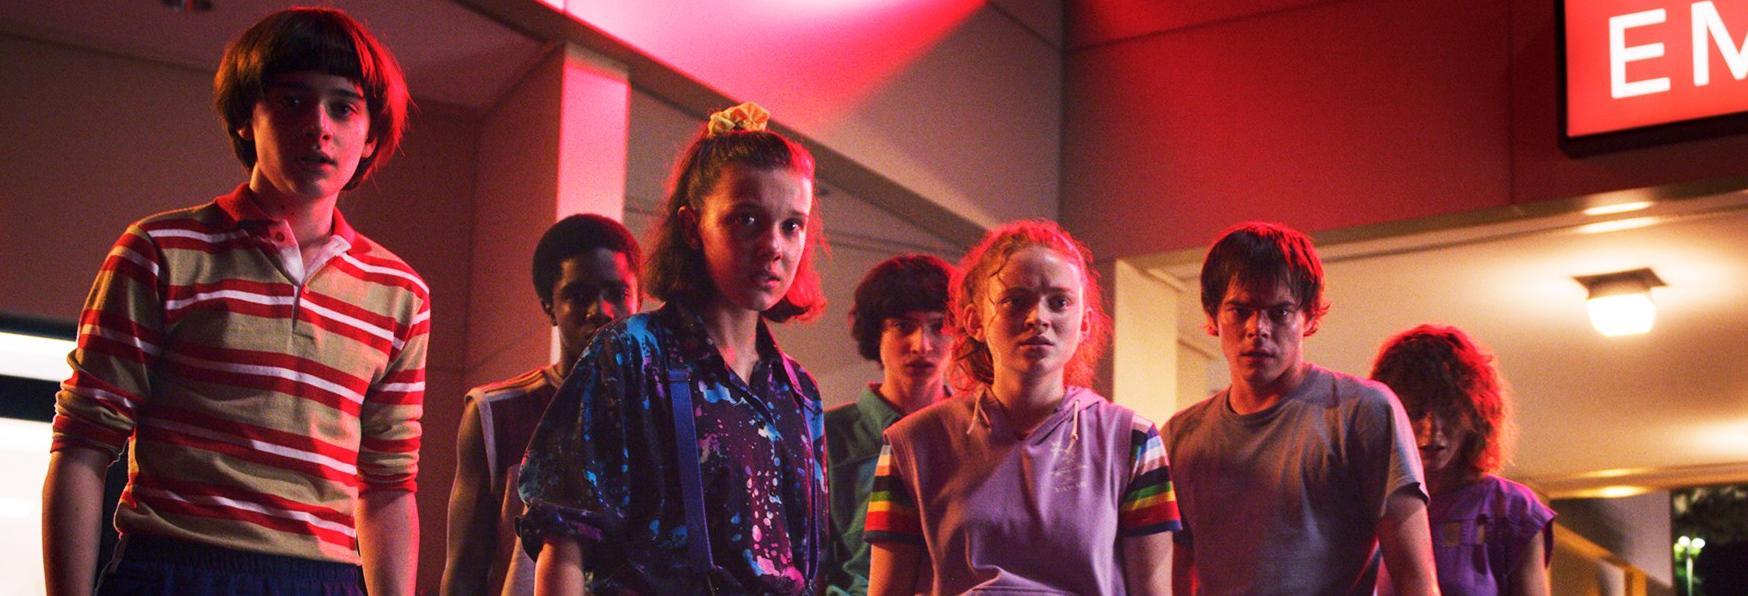 Esperienze Seriali: Stranger Things 3 - Ne vale Davvero la Pena?